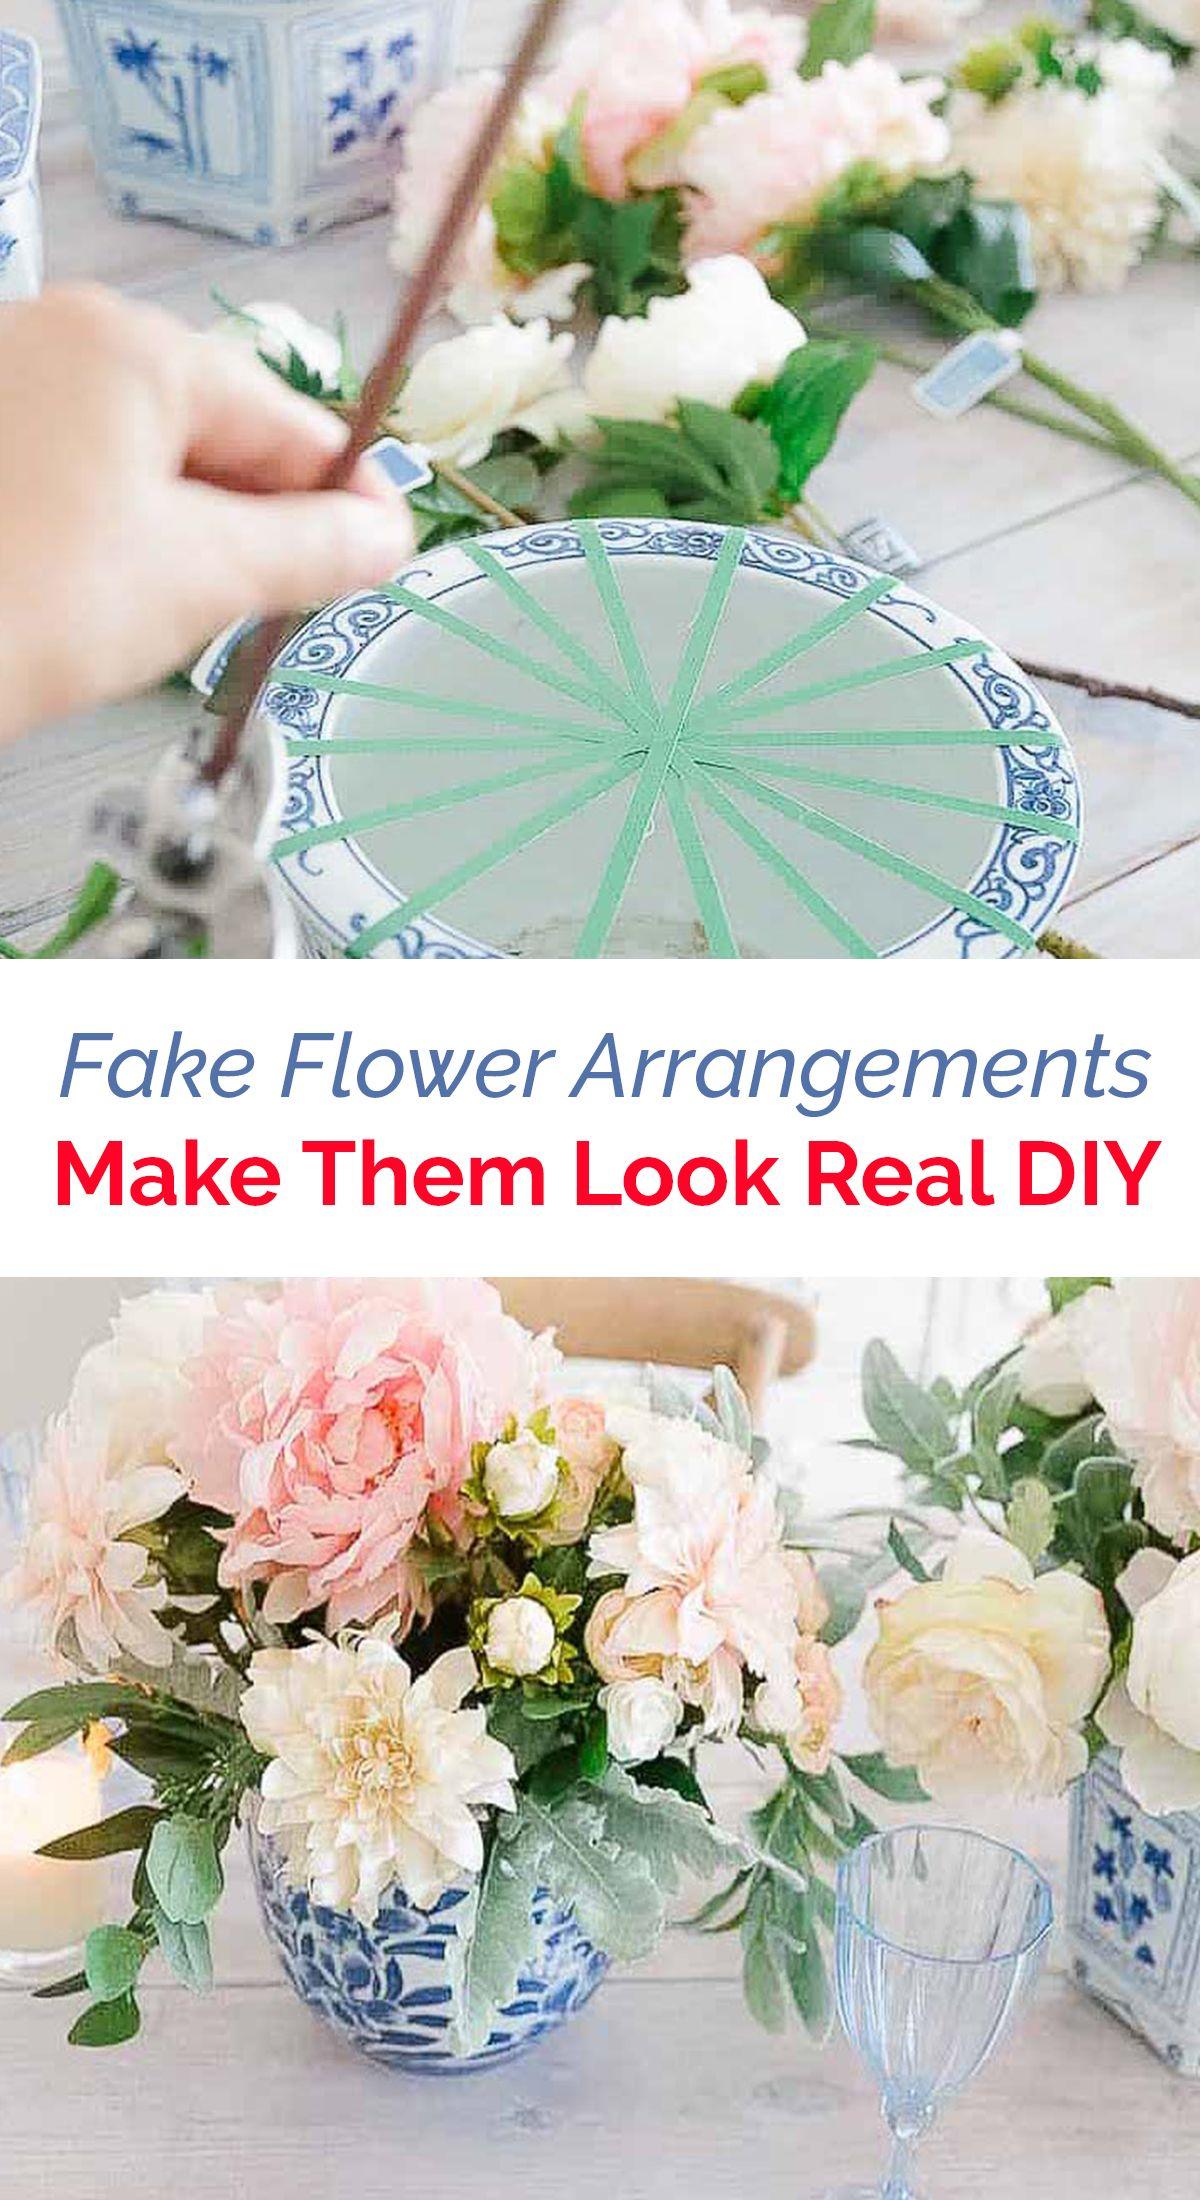 Fake flower arrangements make them look real diy fake